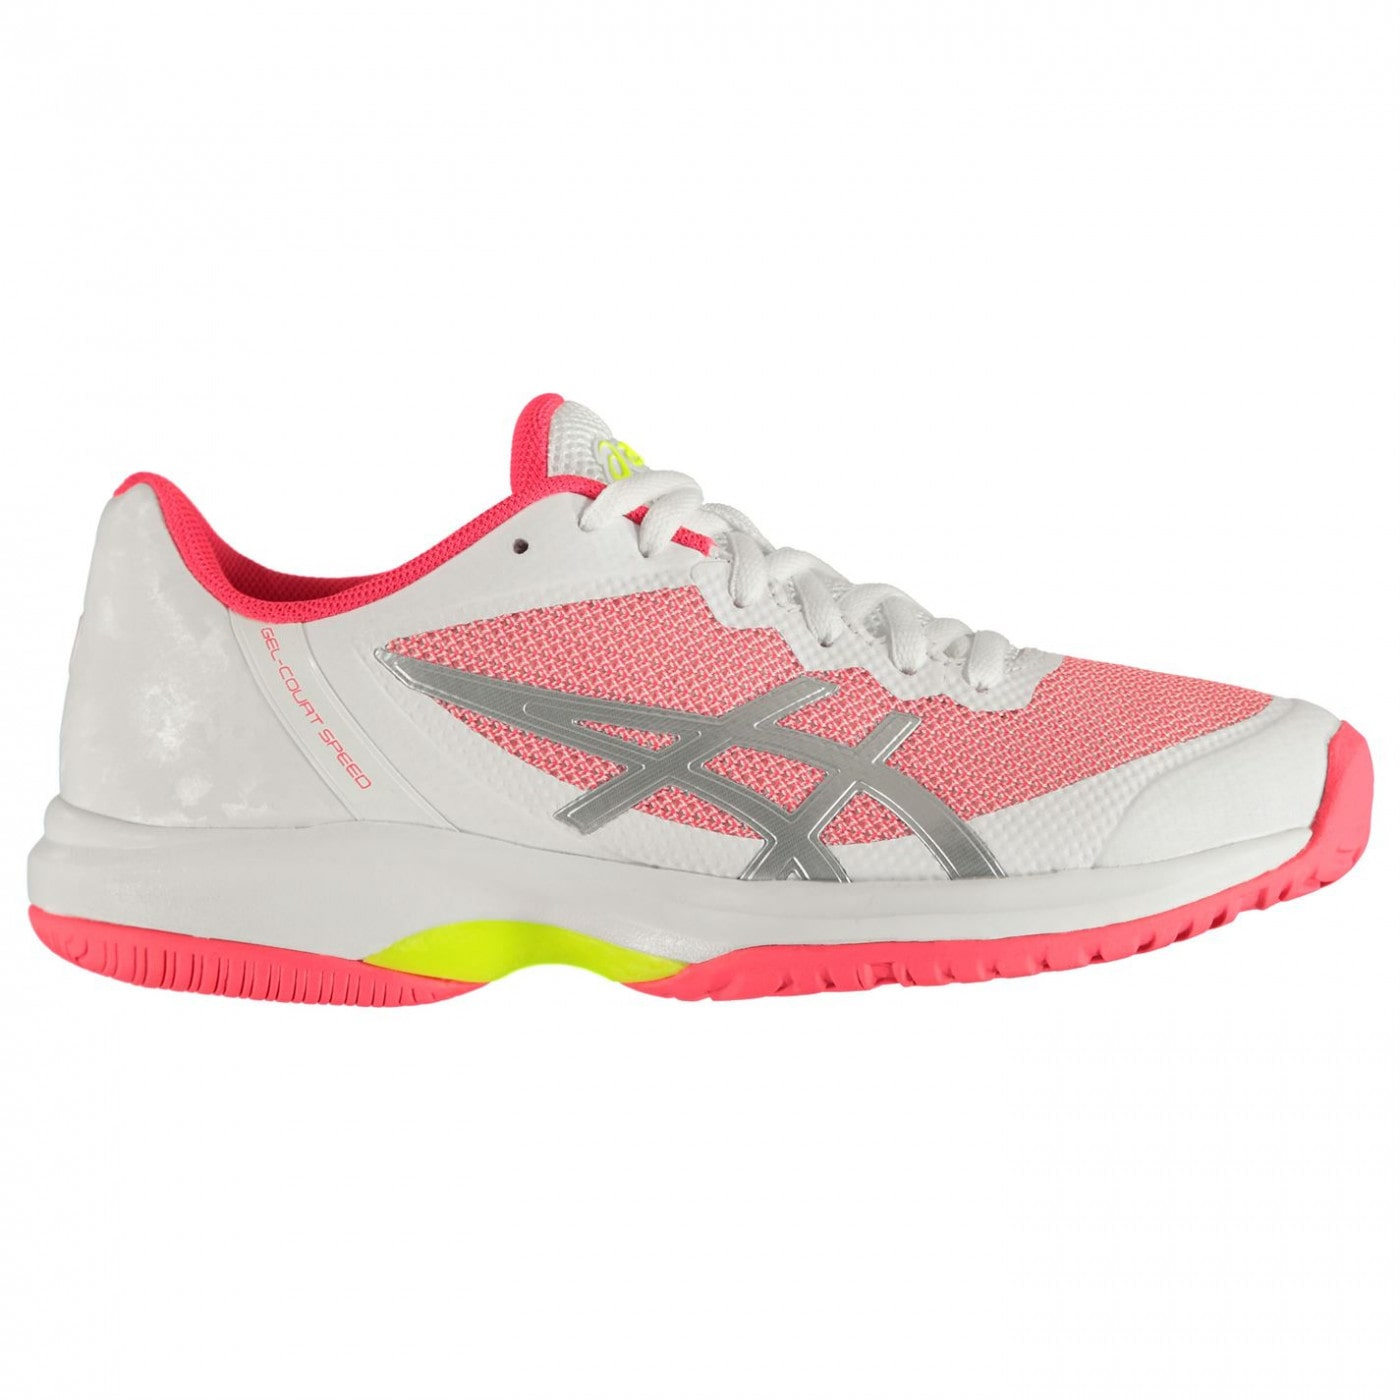 Asics Gel-Court Speed Ladies Tennis Shoes